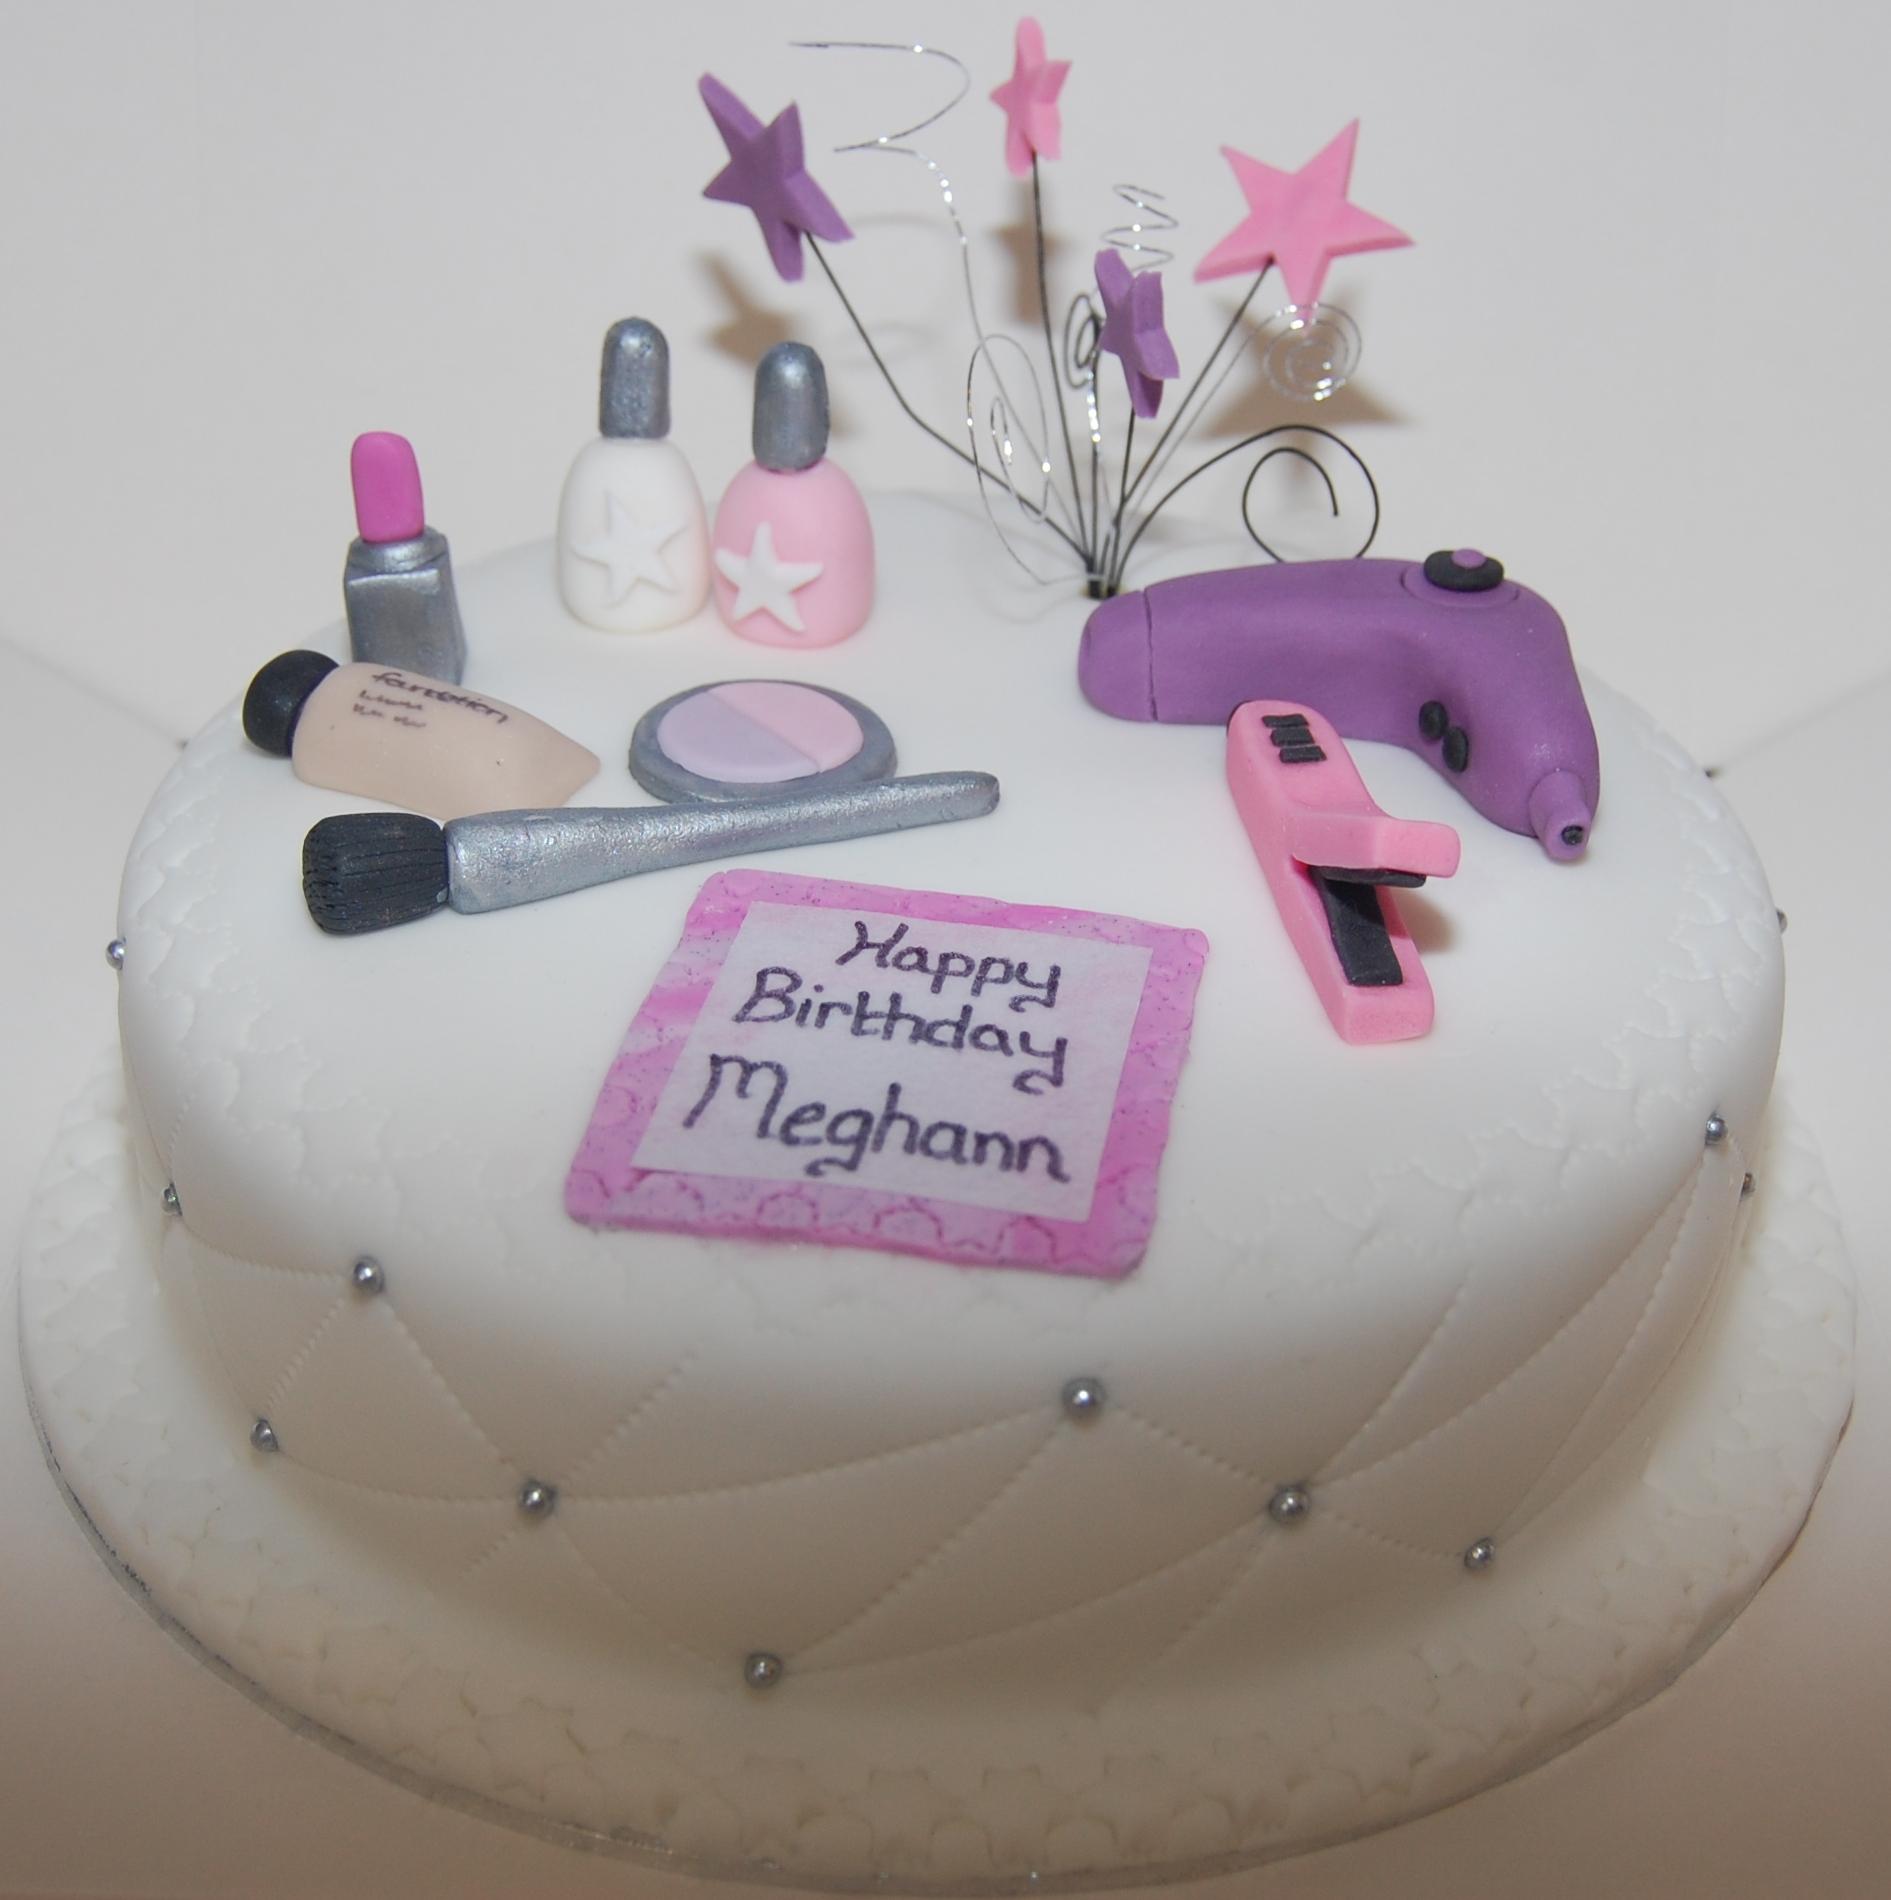 Nail Design Cakes: Children's Cakes